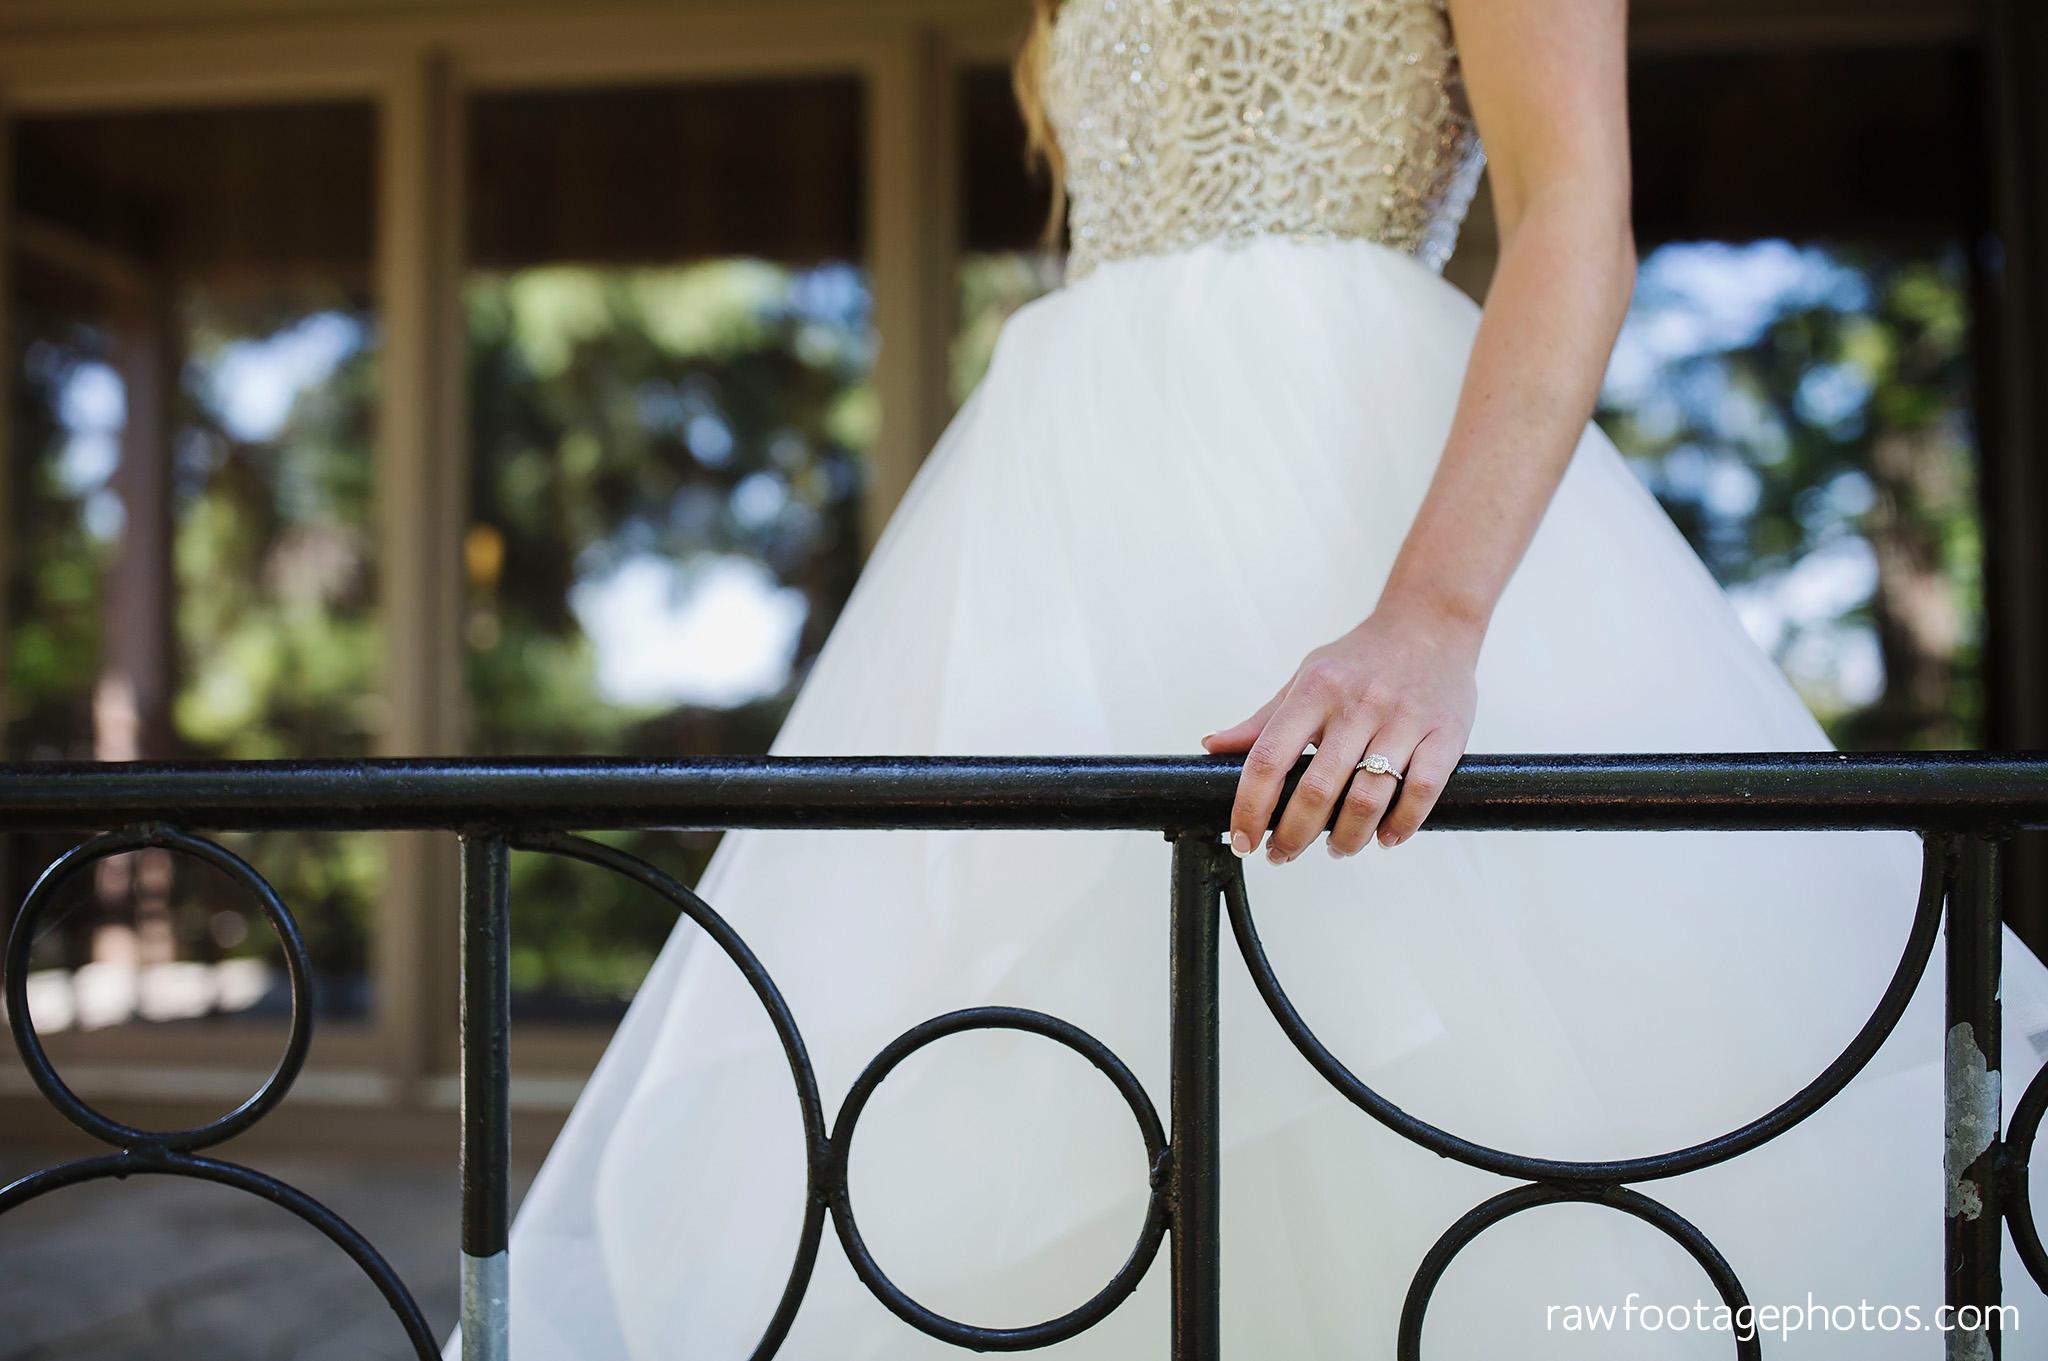 london_ontario_wedding_photographer-grand_bend_wedding_photographer-oakwood_resort_wedding-beach_wedding-sunset_wedding-raw_footage_photography027.jpg